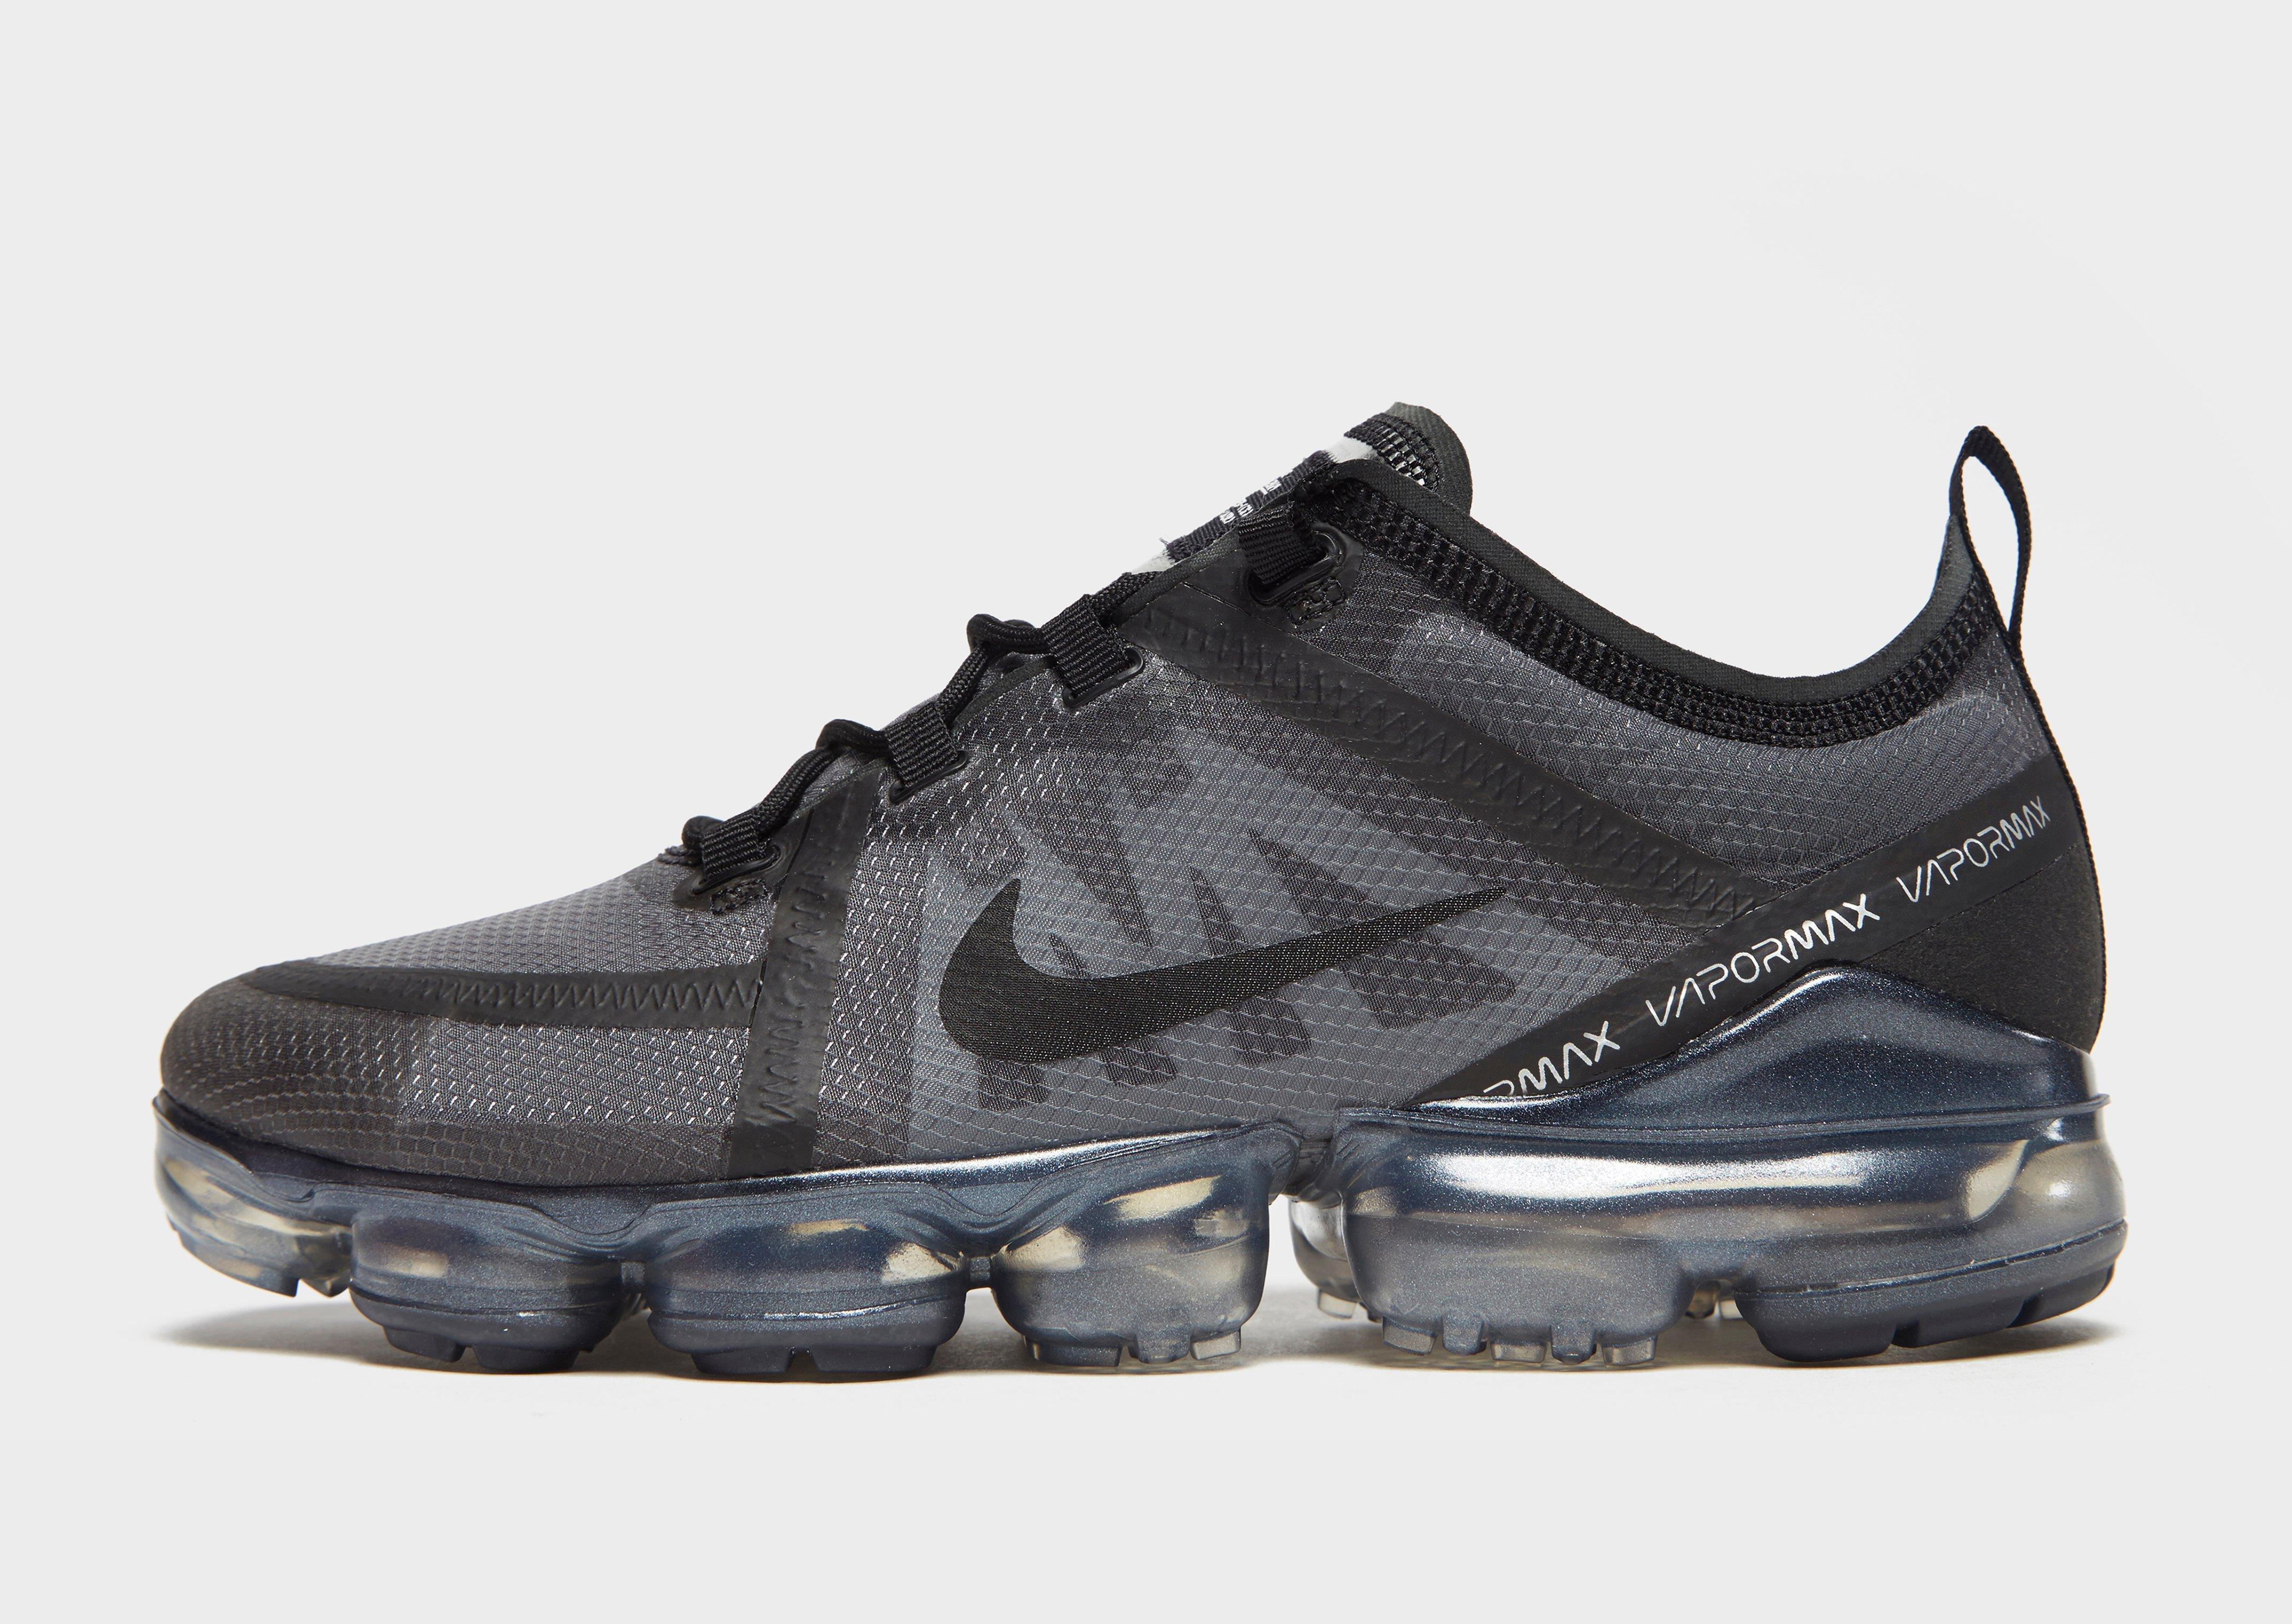 0ad9130f0cf0f1 Nike Air Vapormax 2019 in Black for Men - Lyst